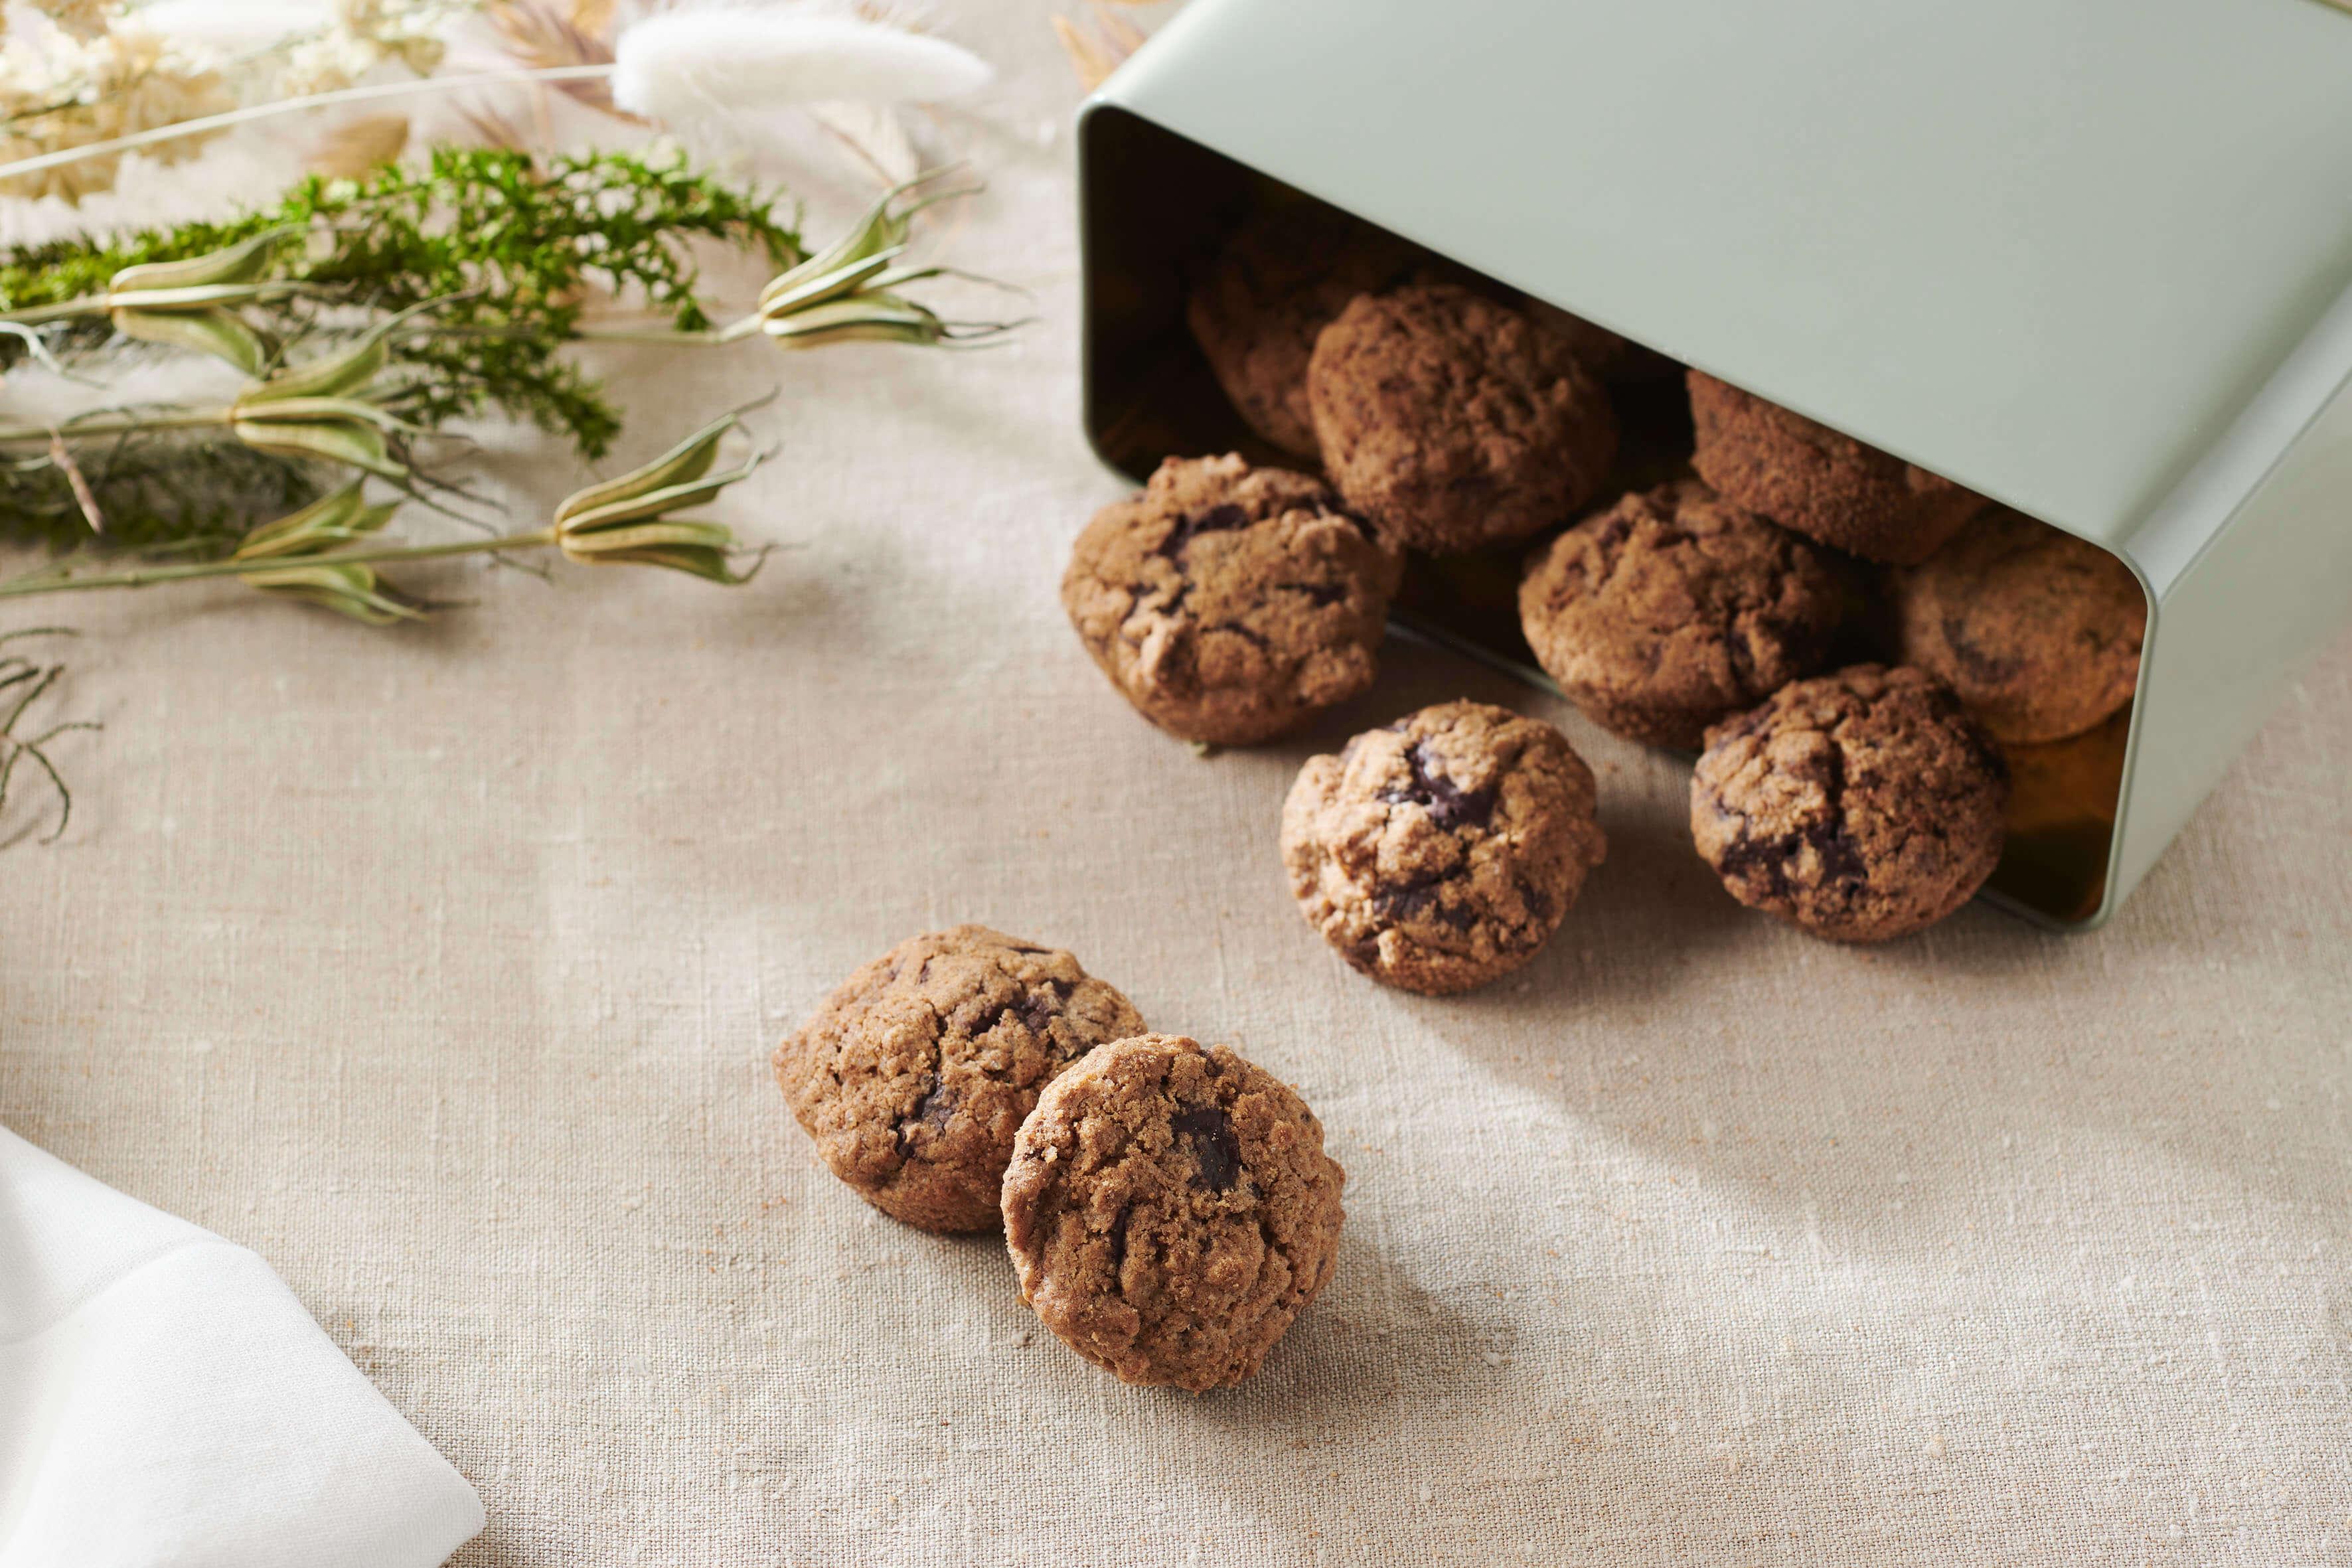 Gluten-Free Buckwheat Chocolate Chip Cookie Recipe